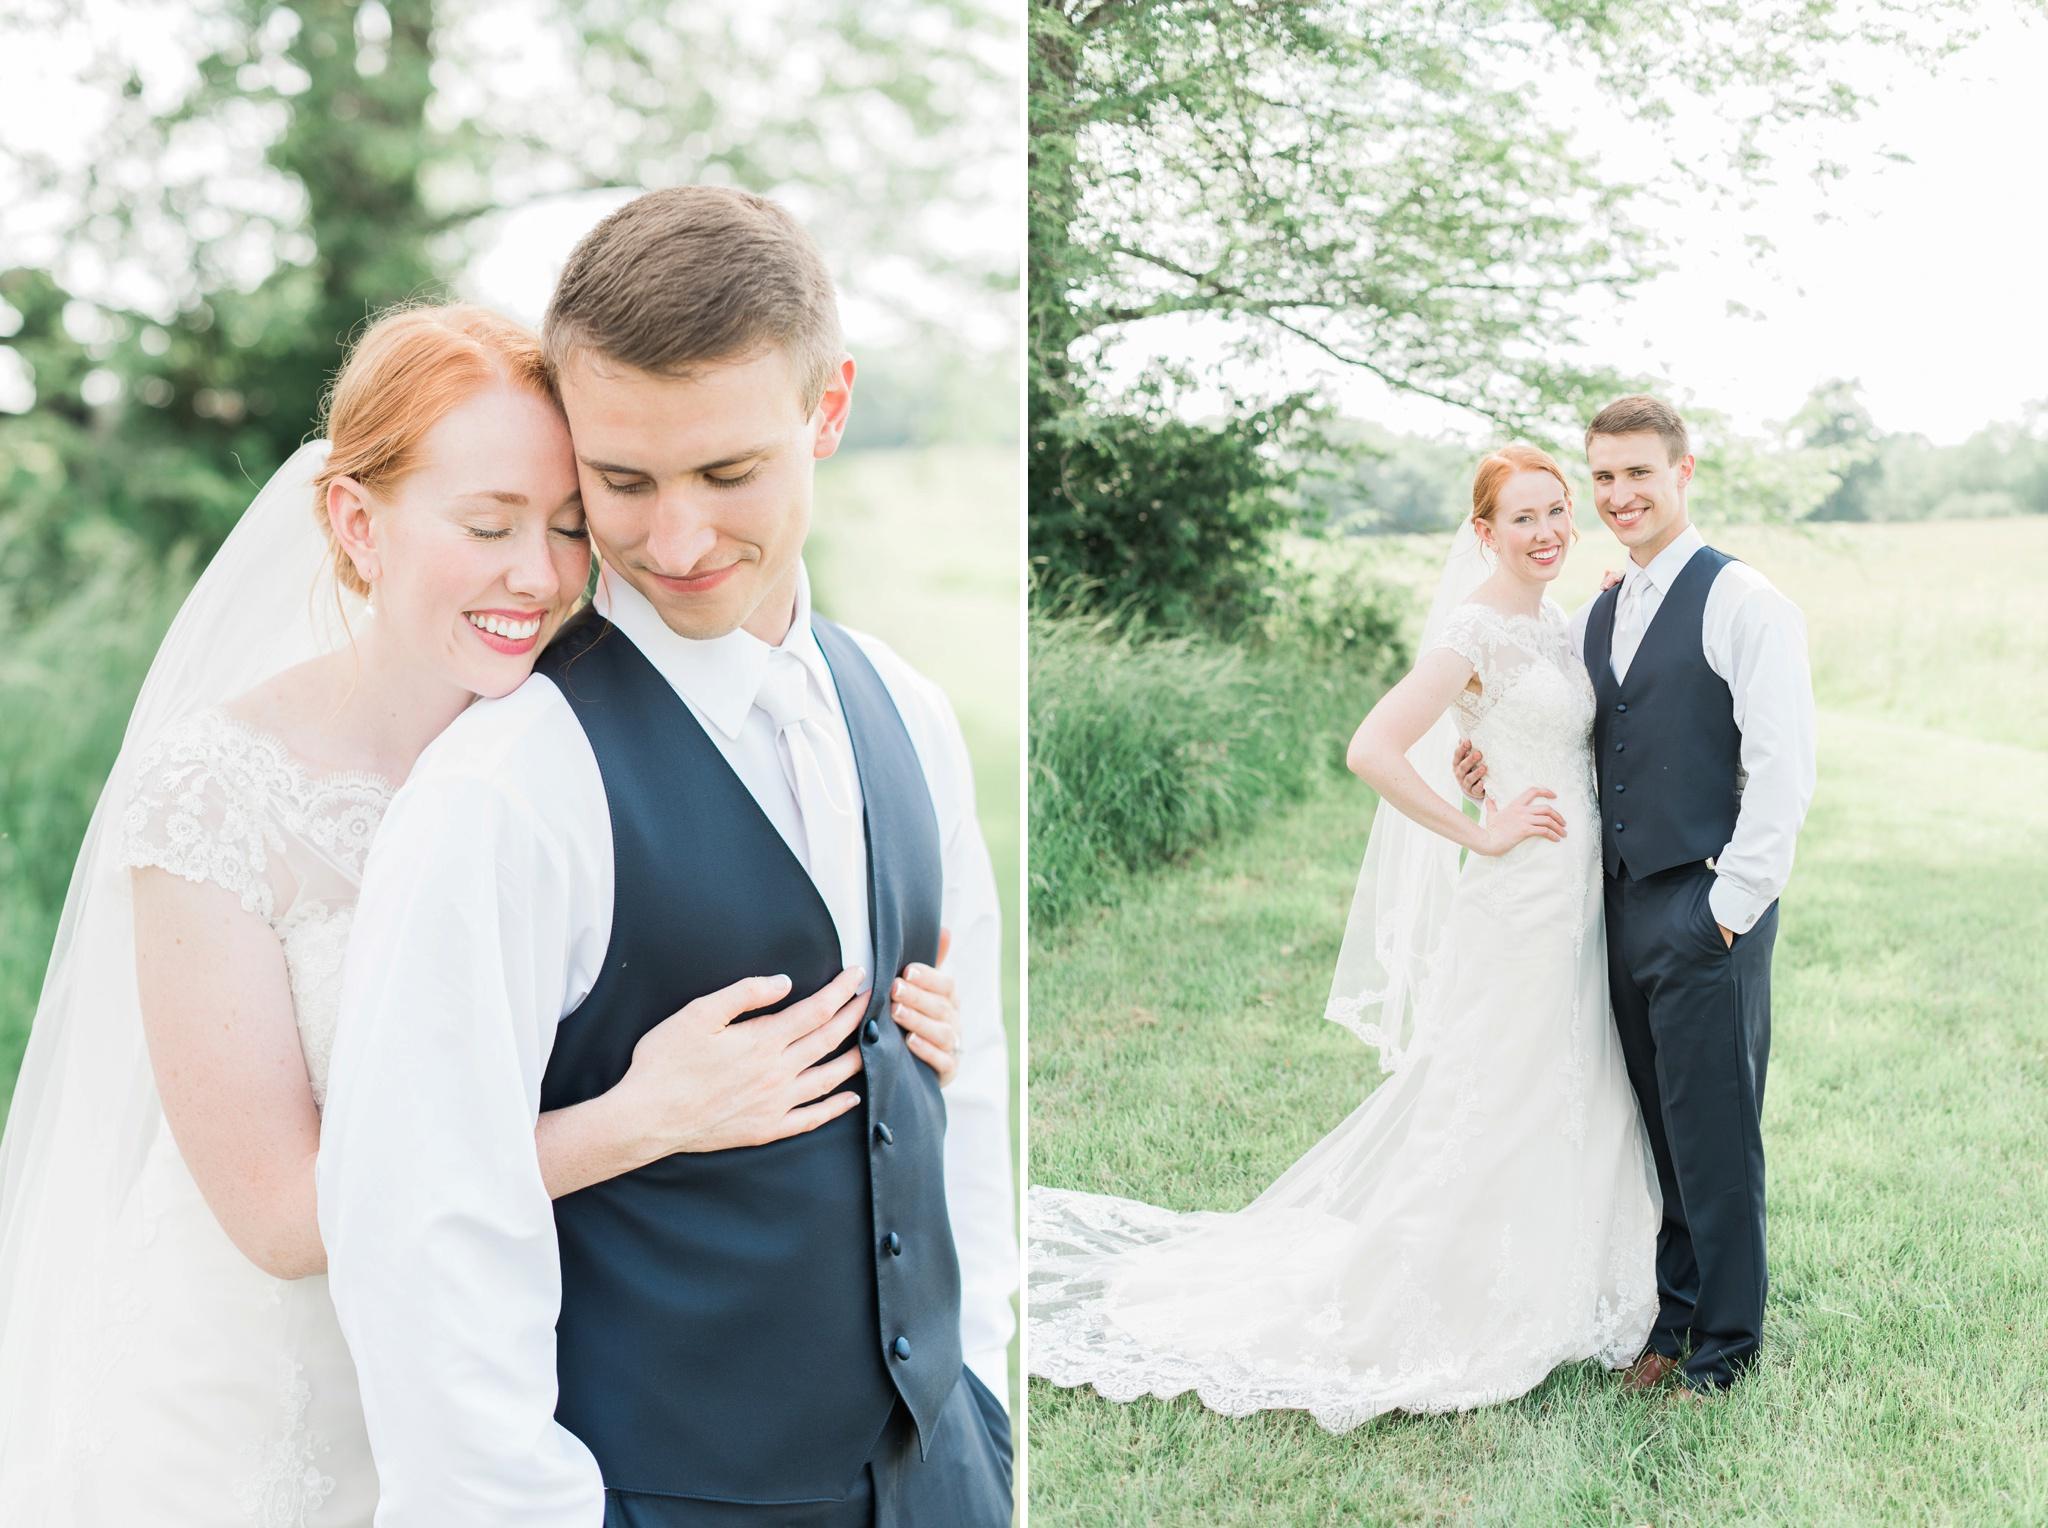 sunbury-ohio-wedding-hannah-johnathan_0094.jpg